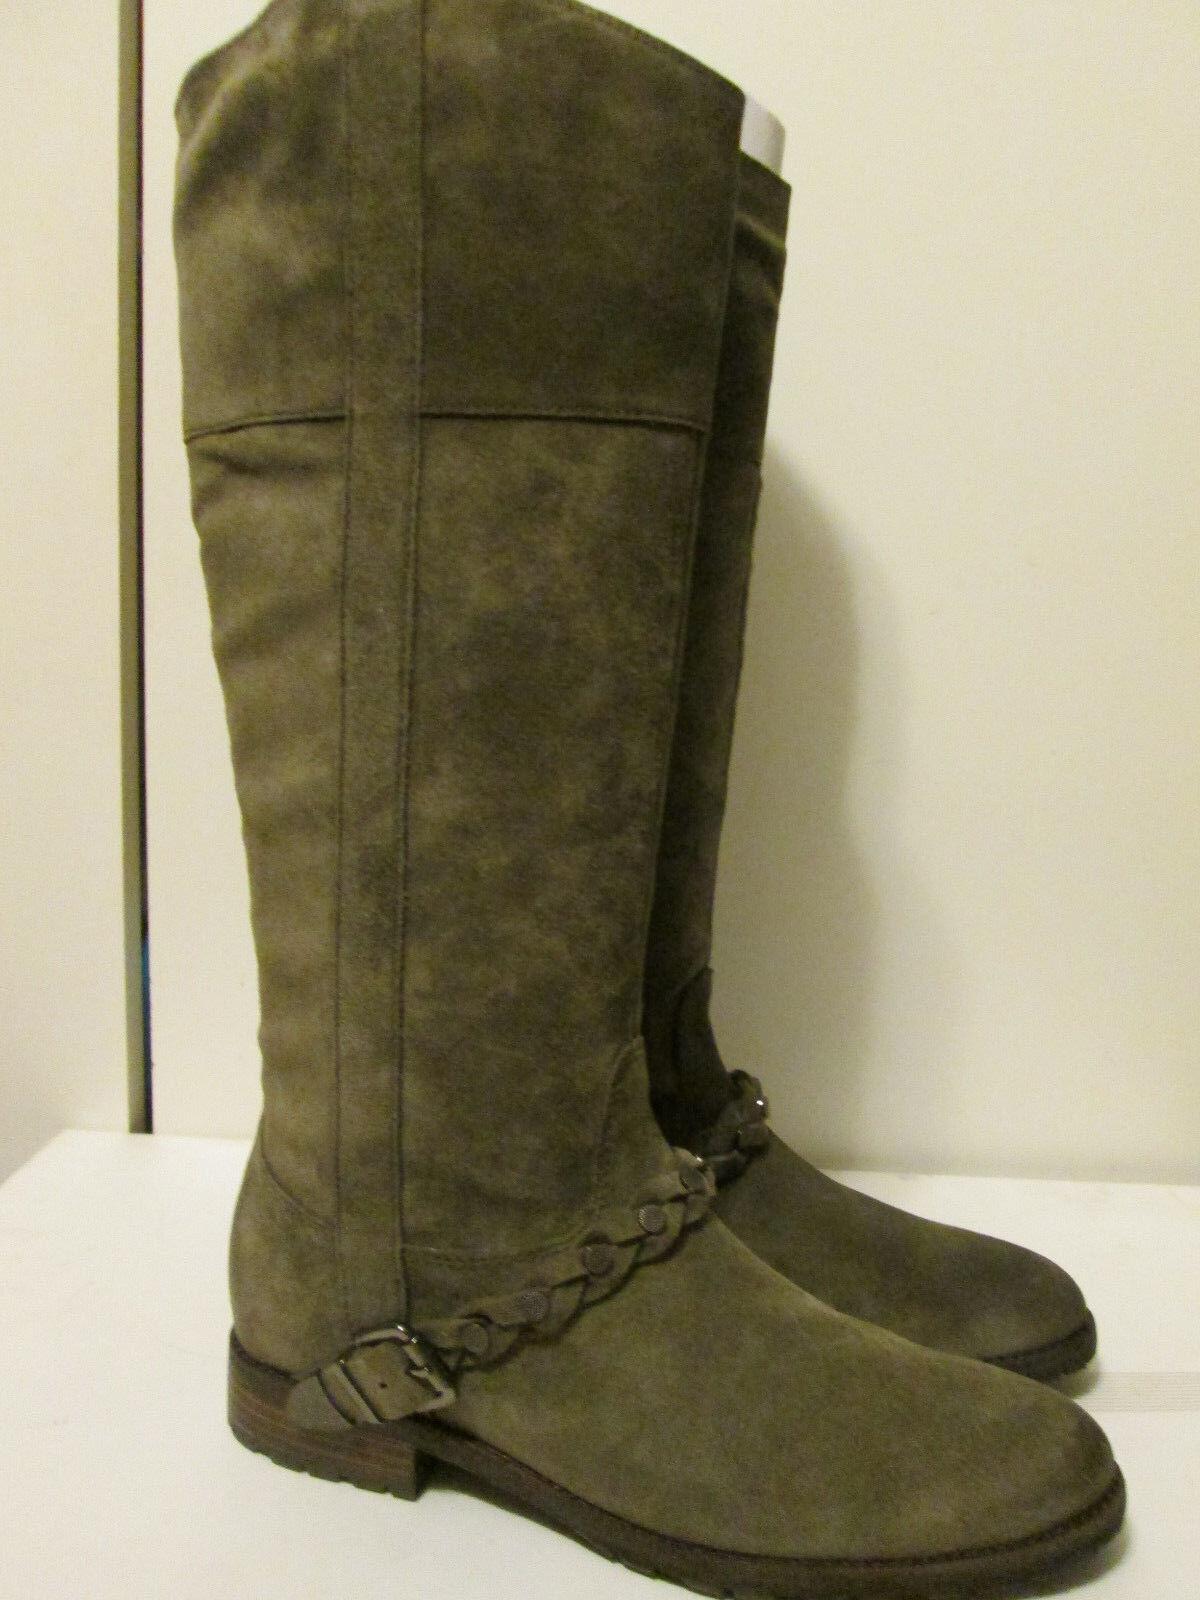 550 Belle by Sigerson Morrison Lyle Vigogna Dakota Suede Knee Hi Boots 8.5 NEW